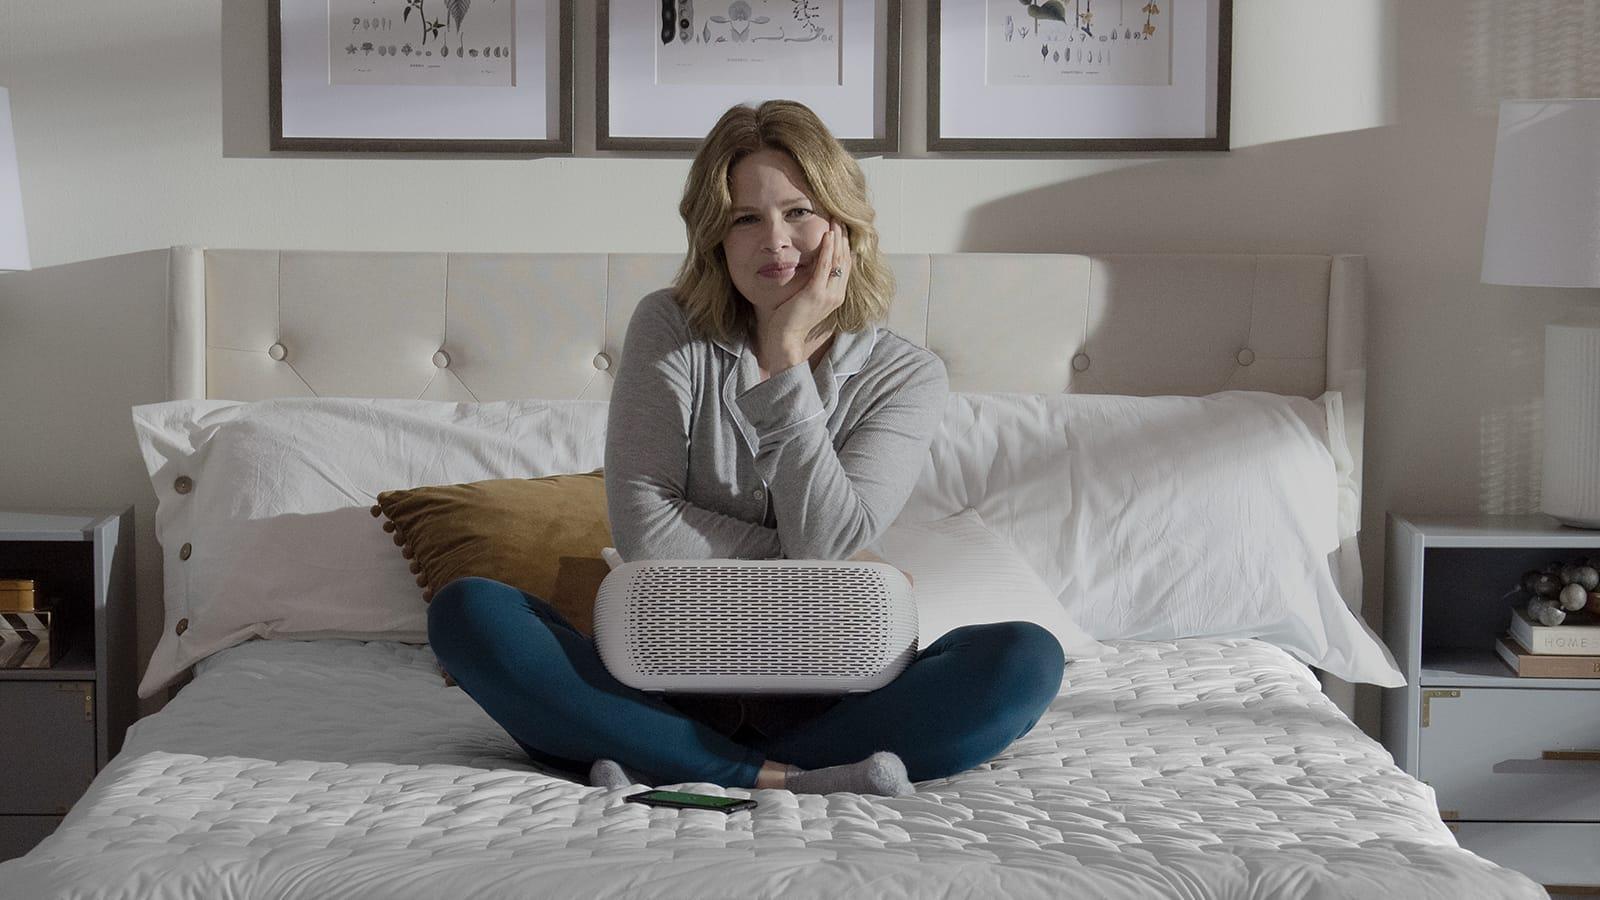 ChiliSleep OOLER advanced sleep system lets you sleep as nature intended